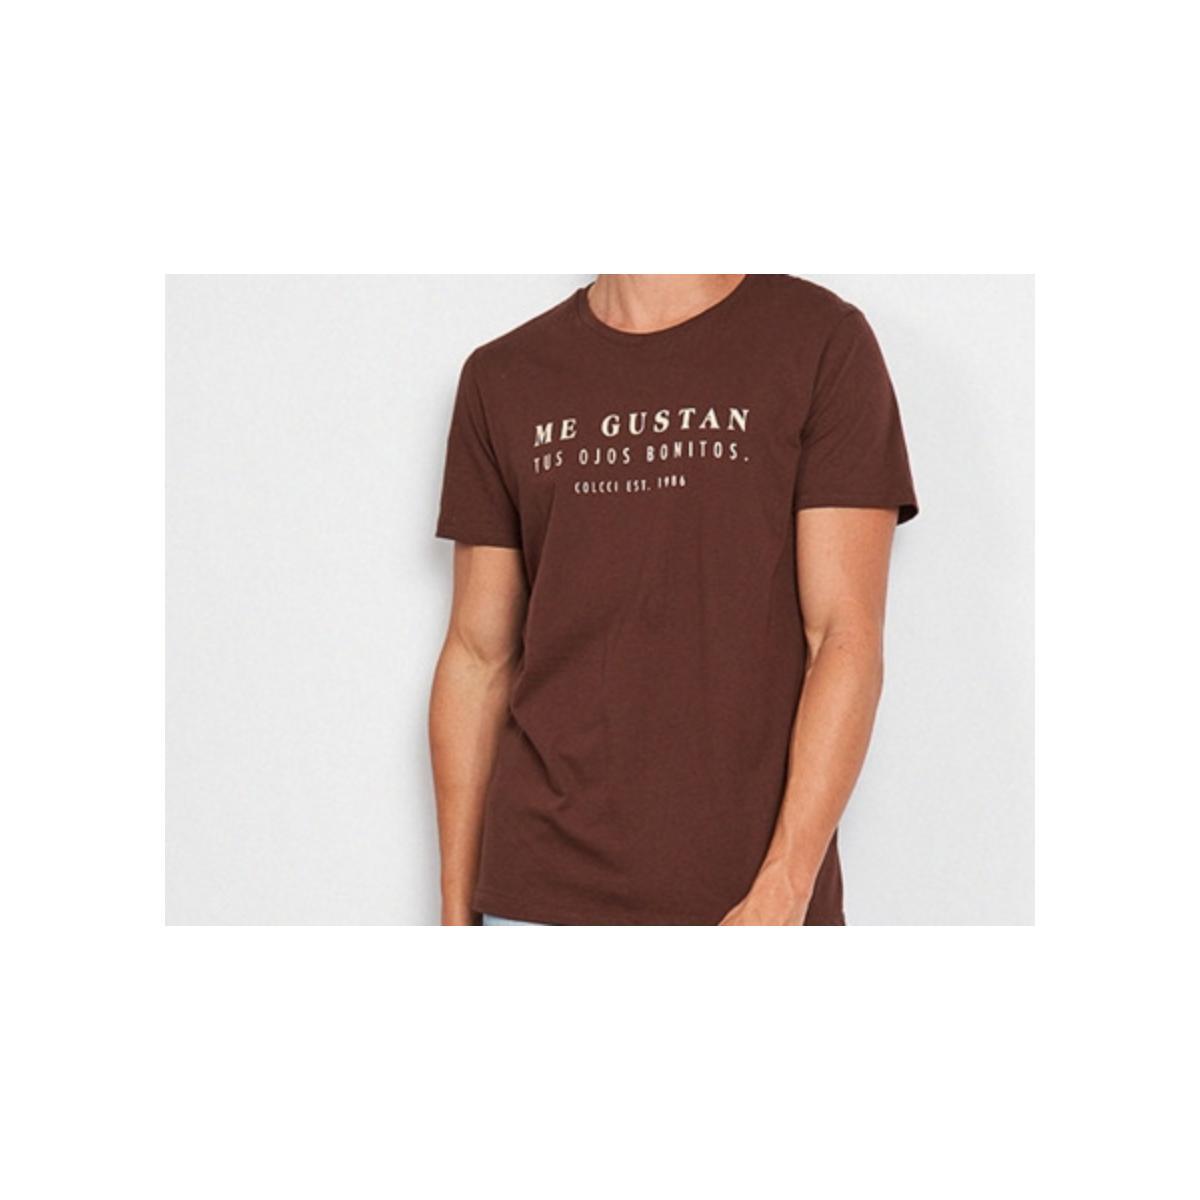 Camiseta Masculina Colcci 350109445 58801 Marrom